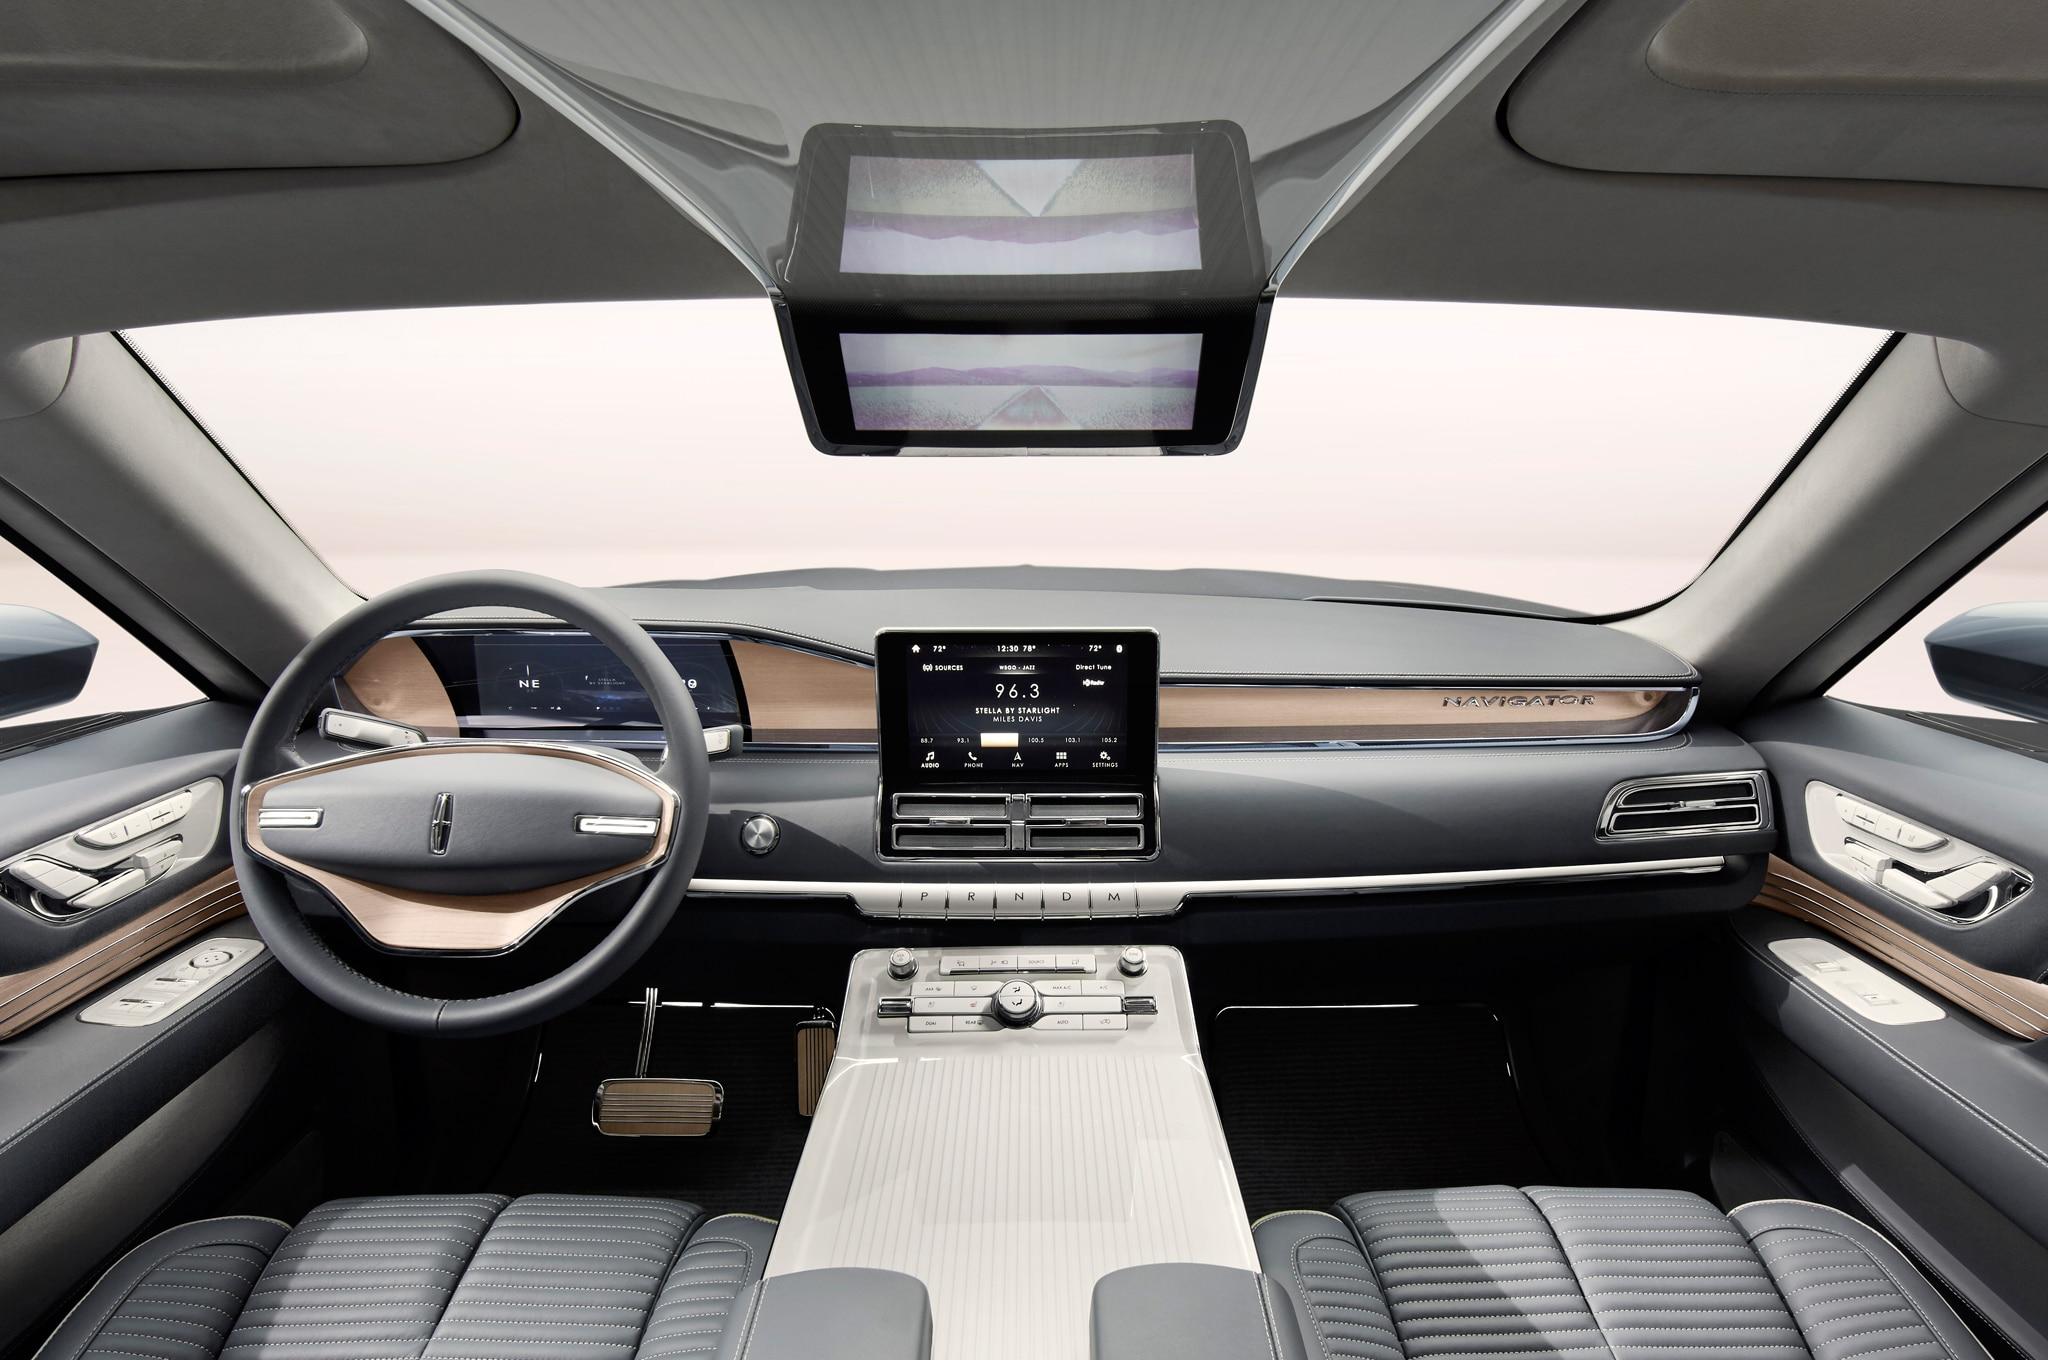 http://st.automobilemag.com/uploads/sites/11/2016/03/Lincoln-Navigator-Concept-interior-cabin.jpg